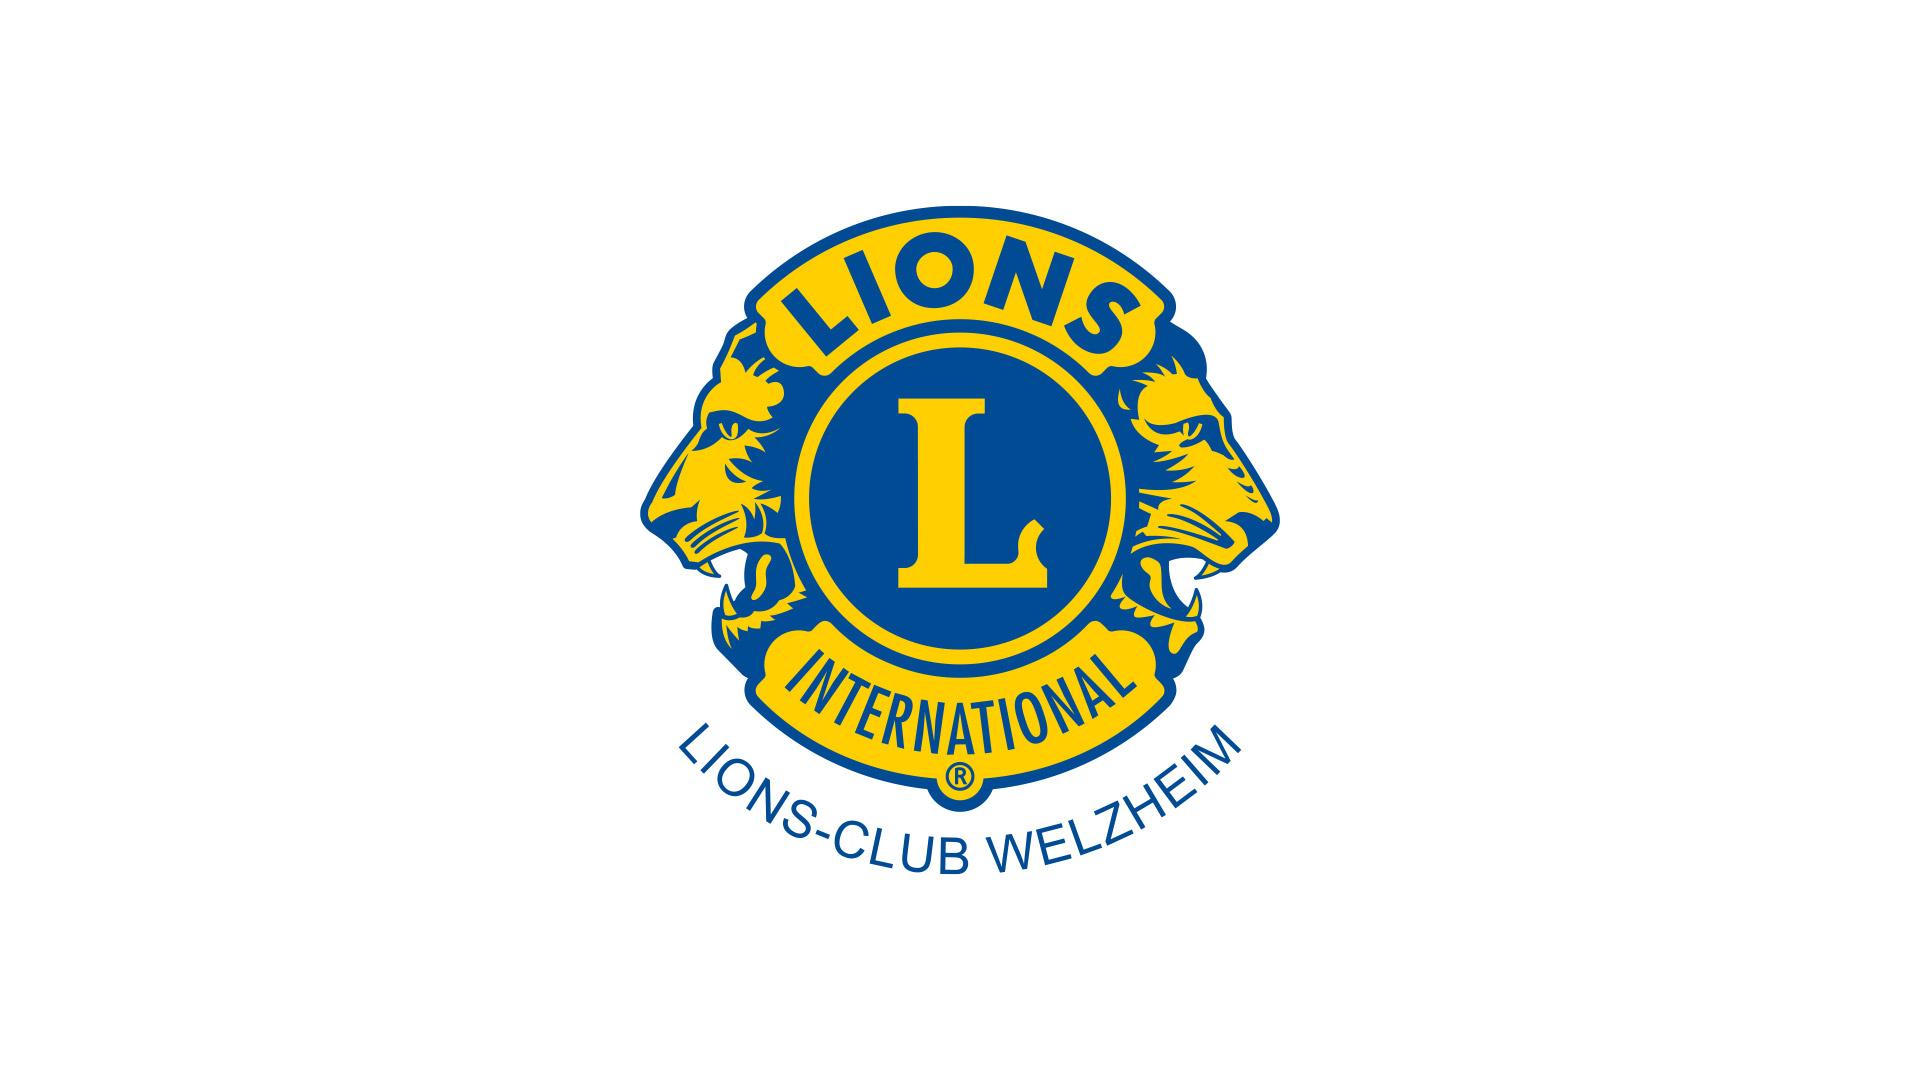 Pfleiderer Projektbau: Sponsoring Lions Club